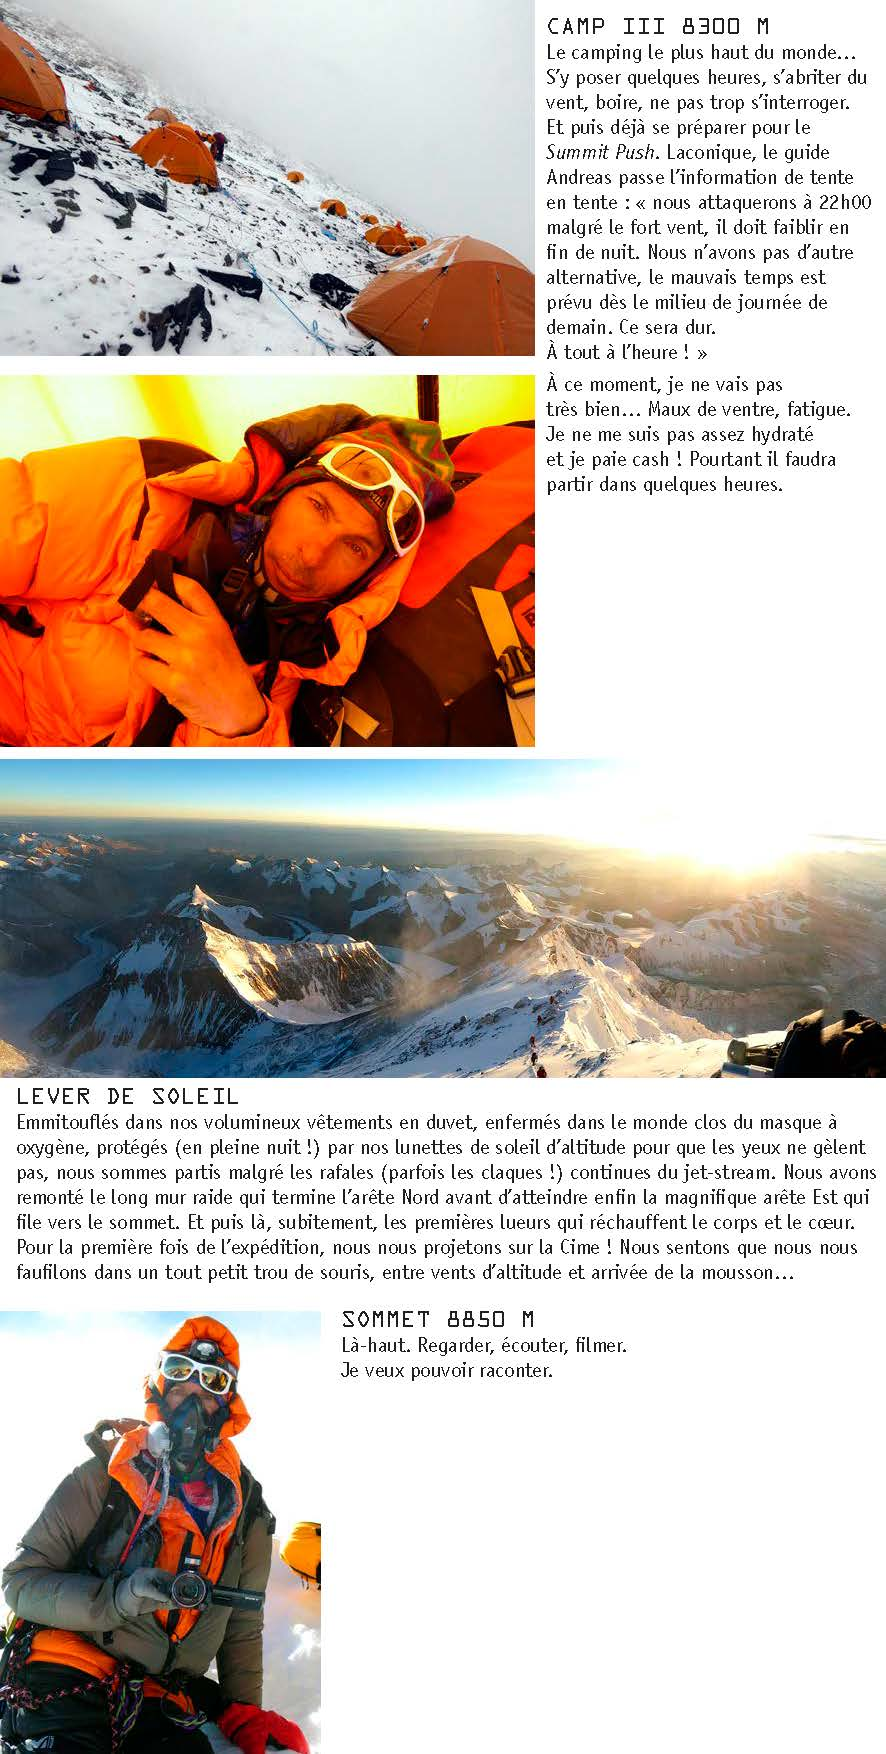 Sum_Everestr_ (2)_Page_5